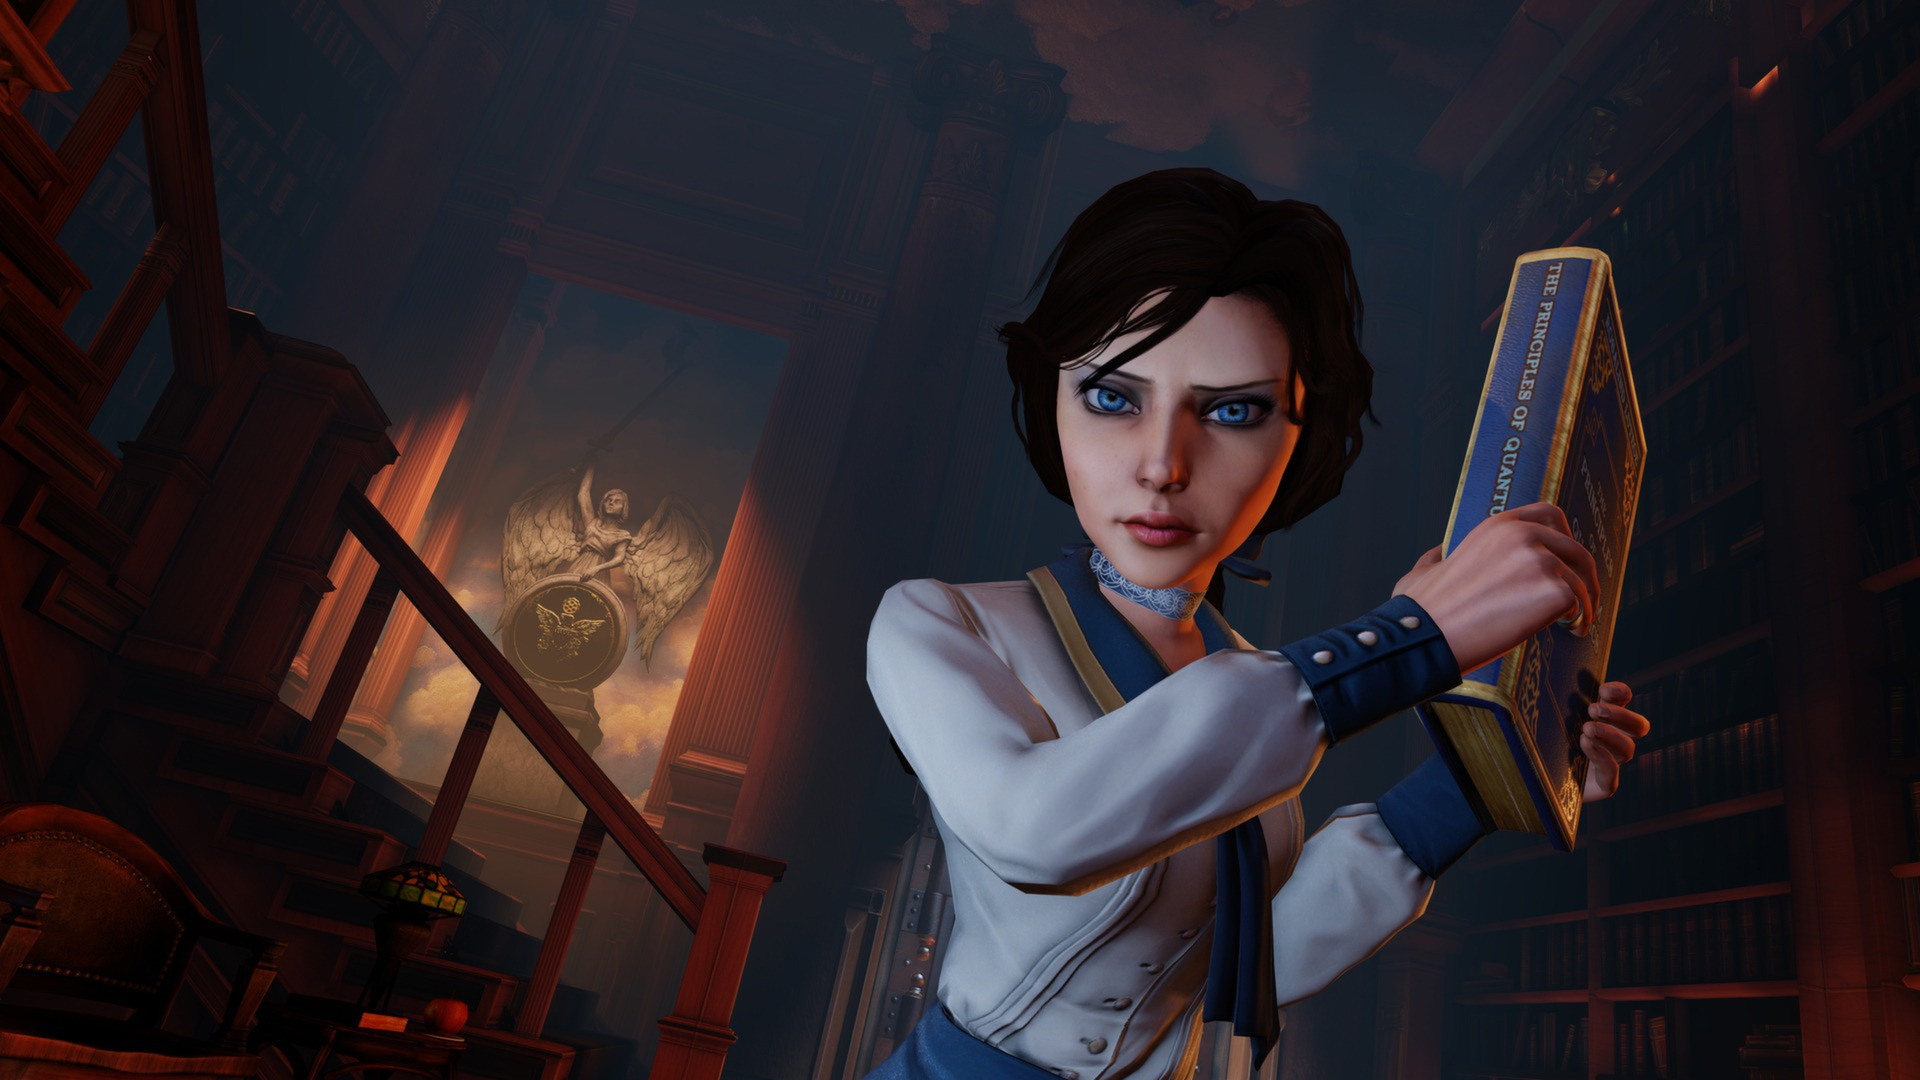 BioShock Infinite Screenshot 2